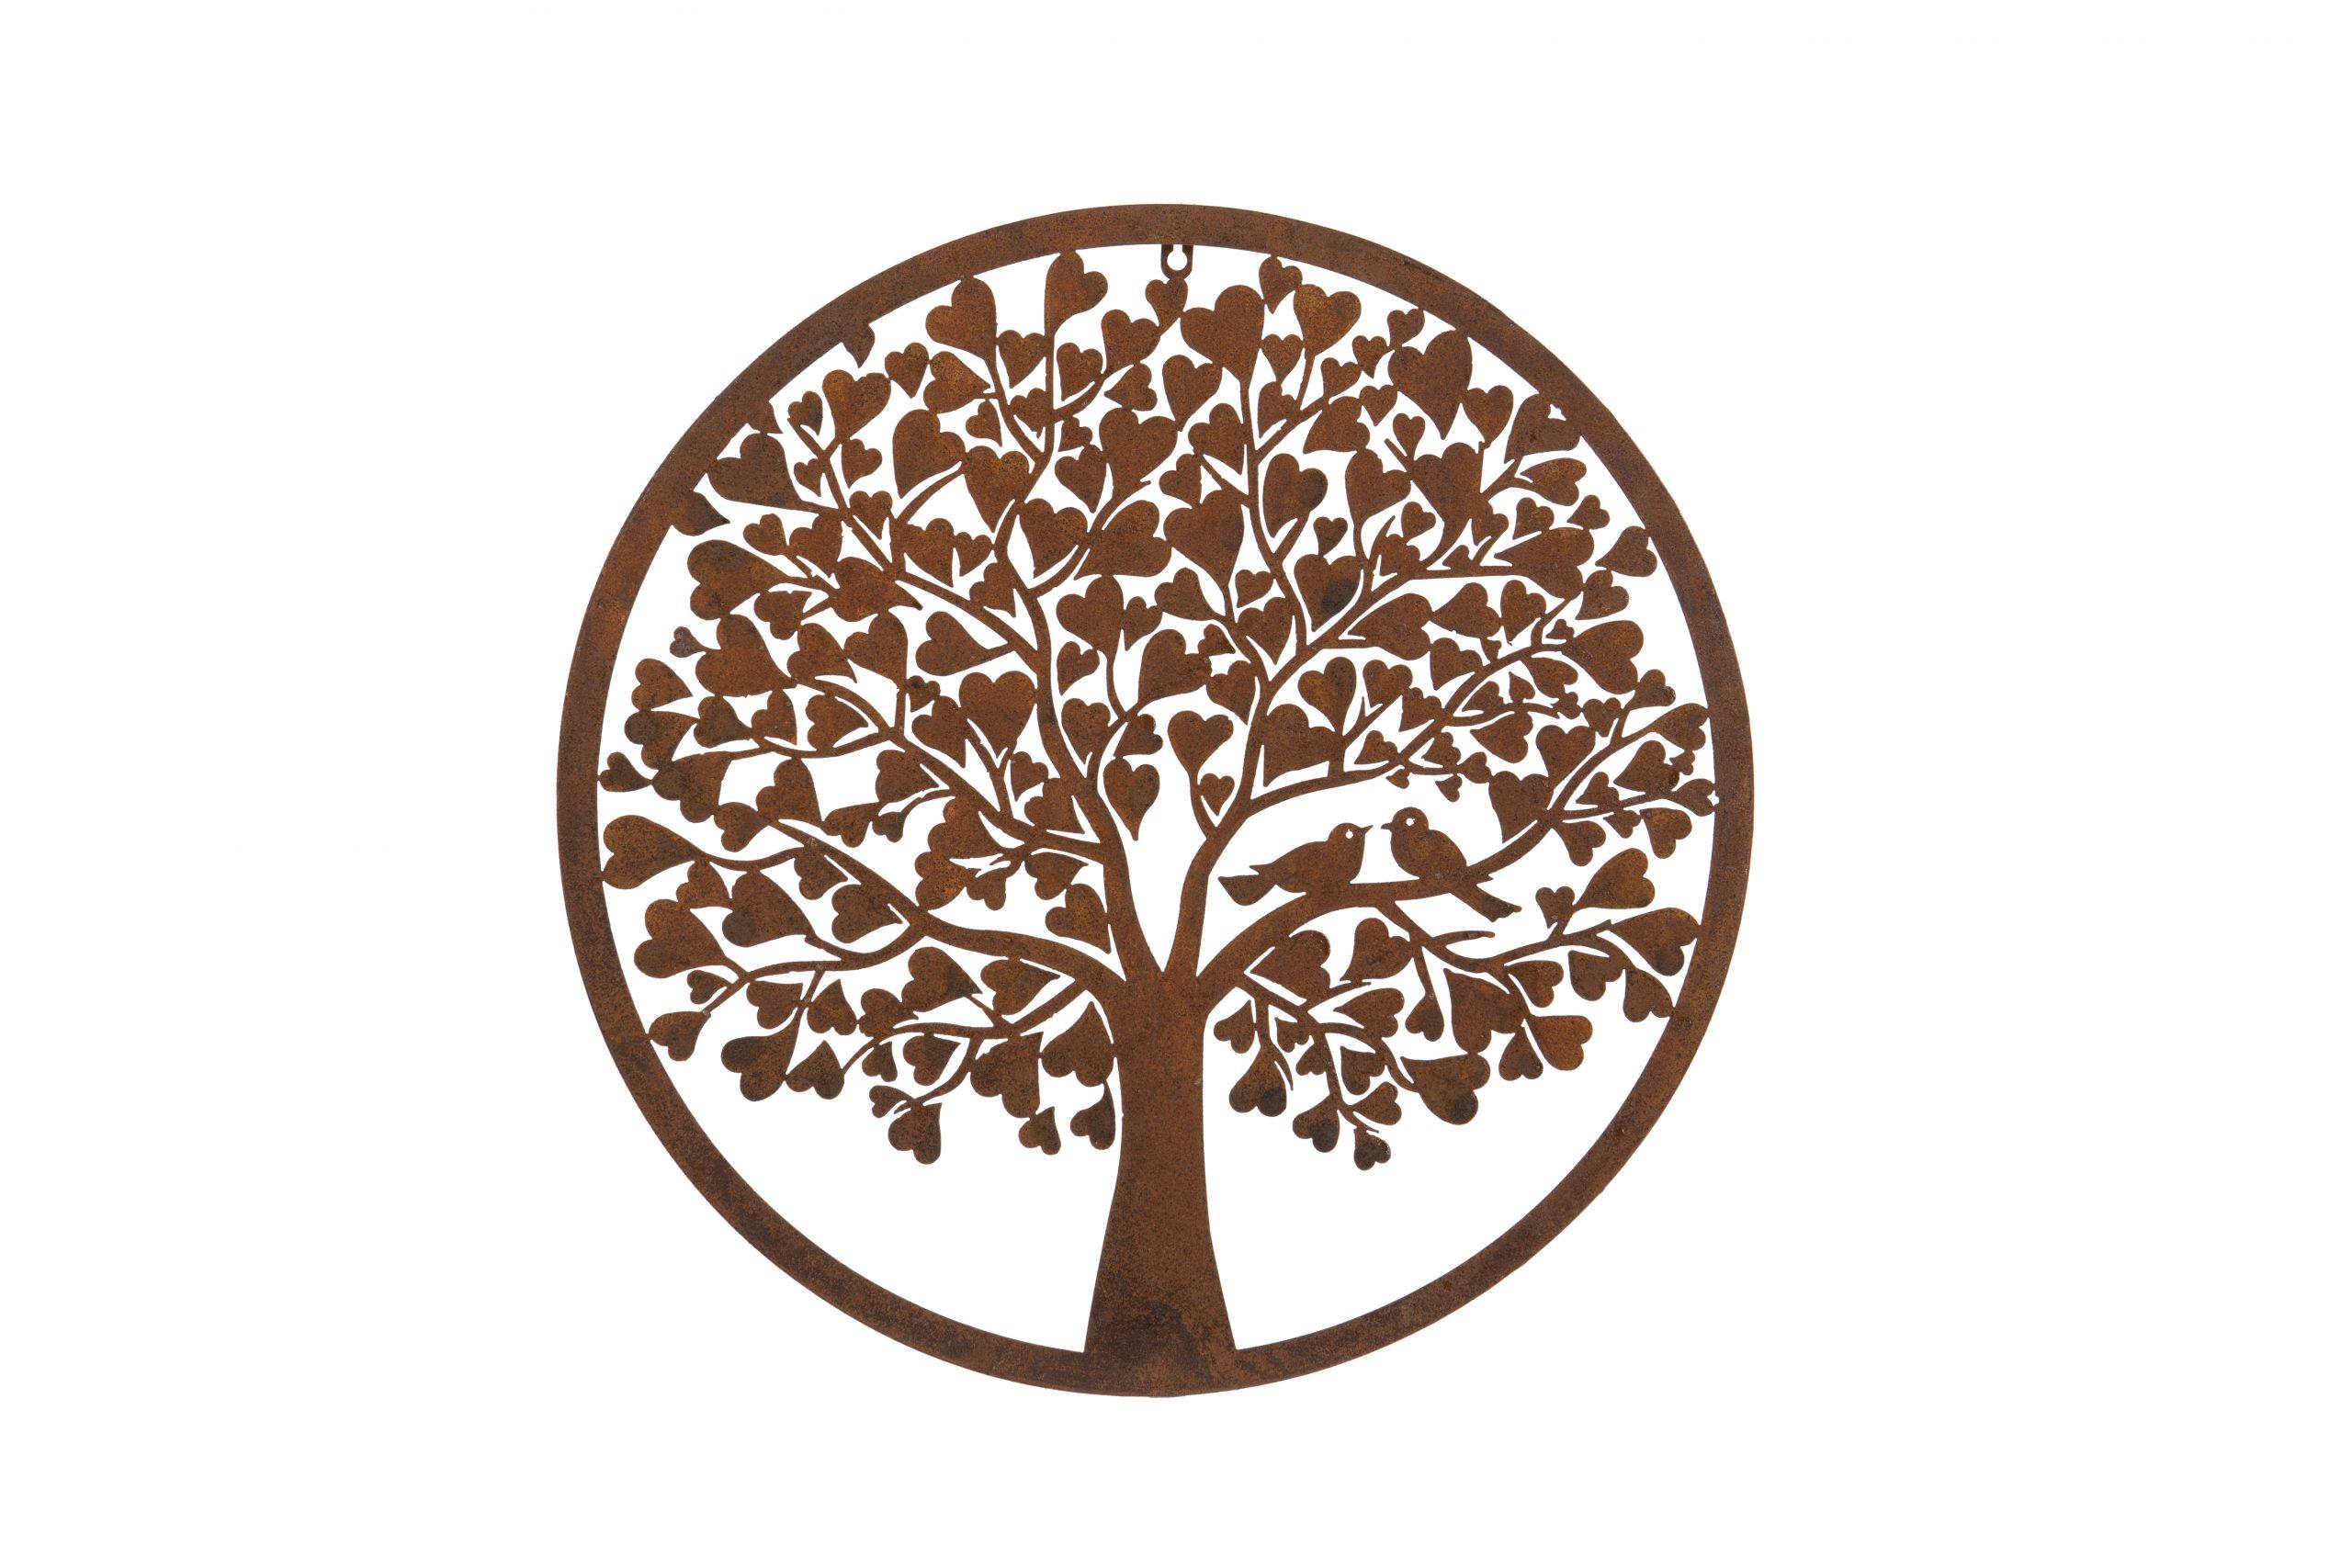 Rust Heart Tree wall plaque